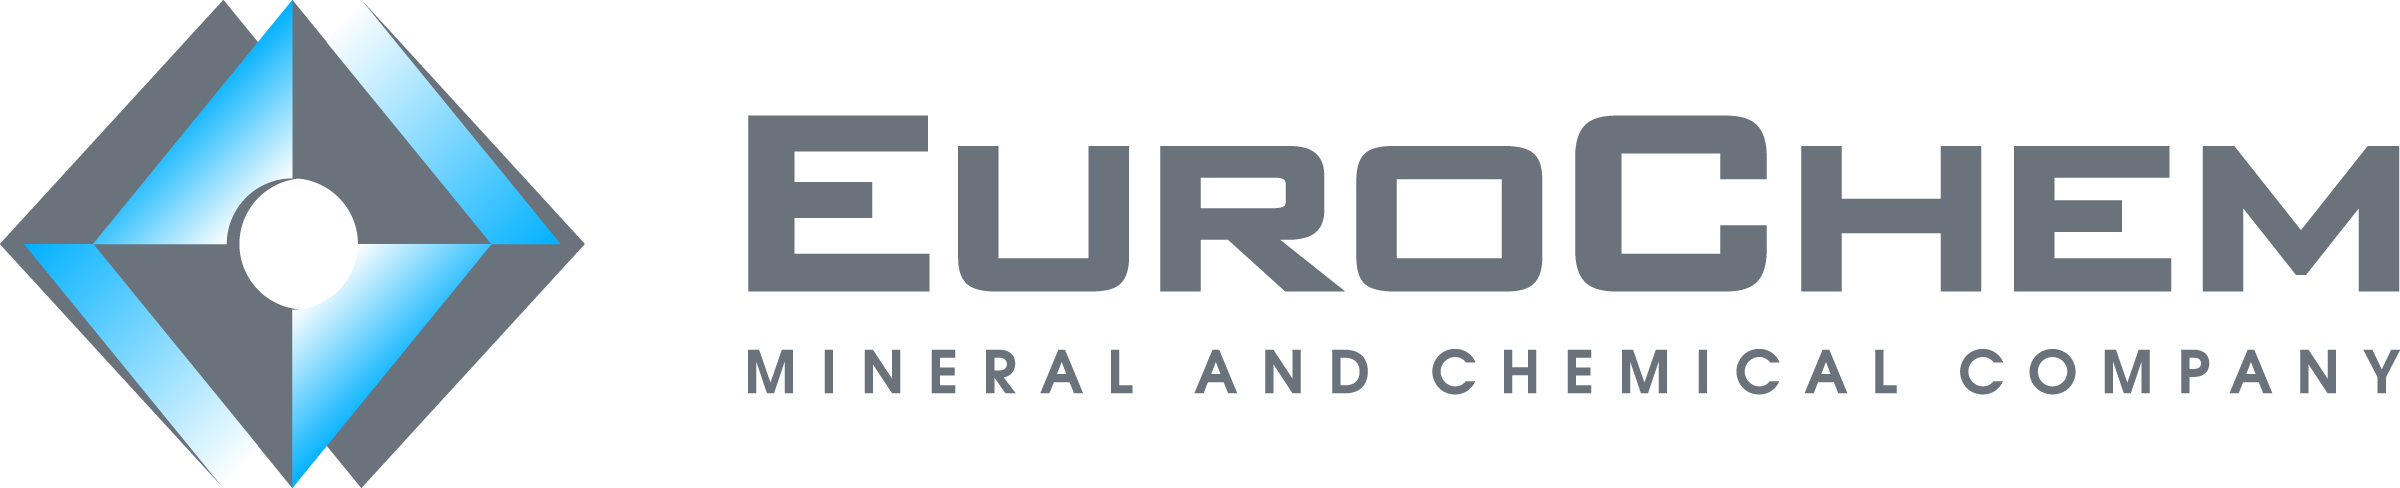 File:EuroChem logo eng.png - Wikimedia Commons